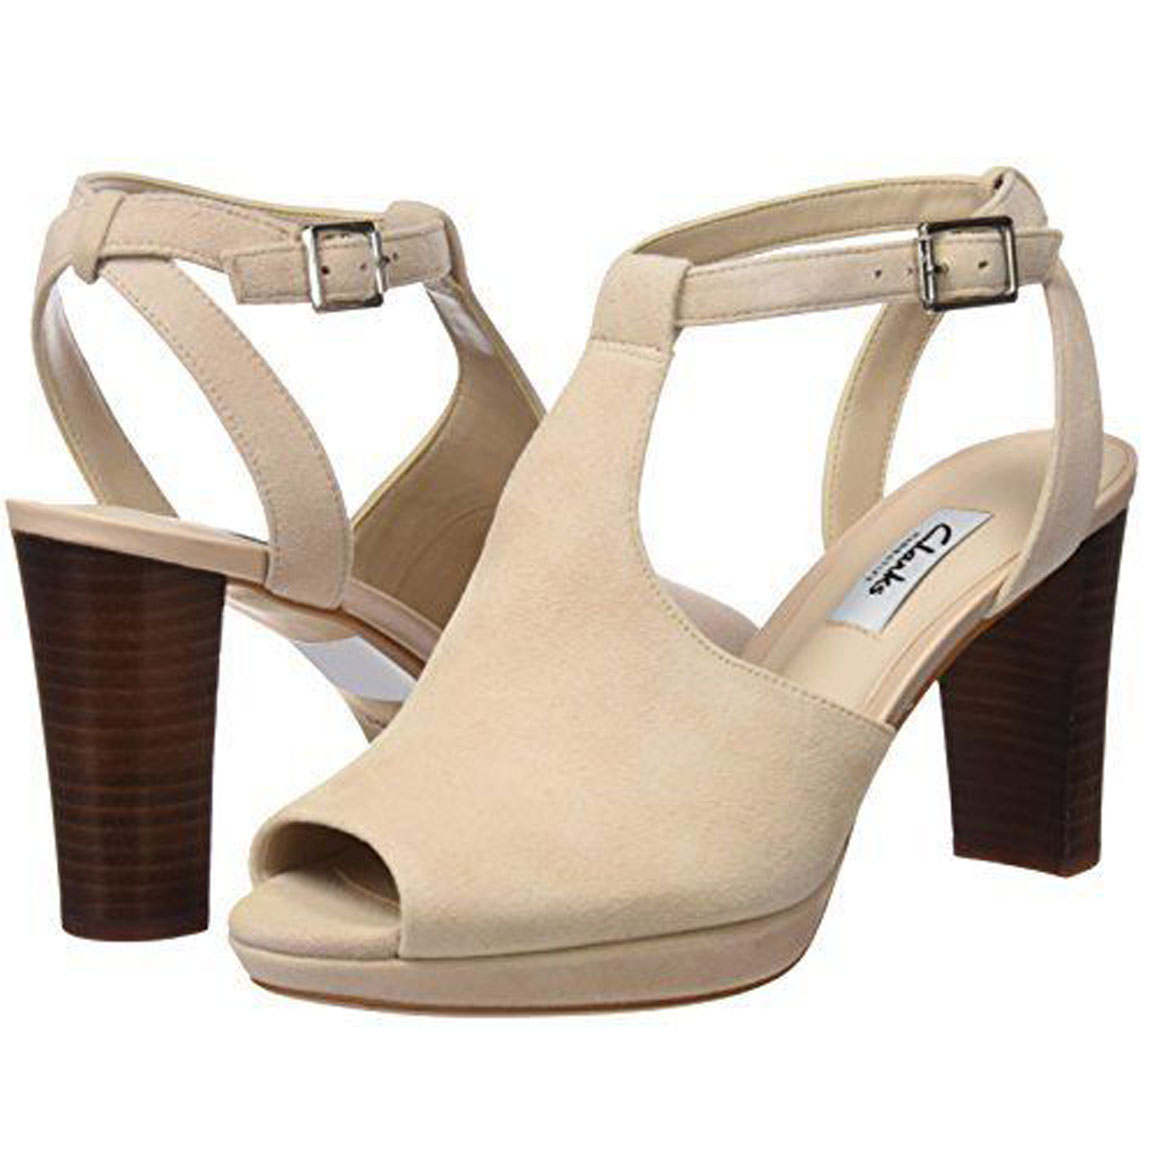 86fce4e15b73 Sentinel Clarks Kendra Charm Womens Nude T Bar High Block Heel Slingback  Sandals UK 6